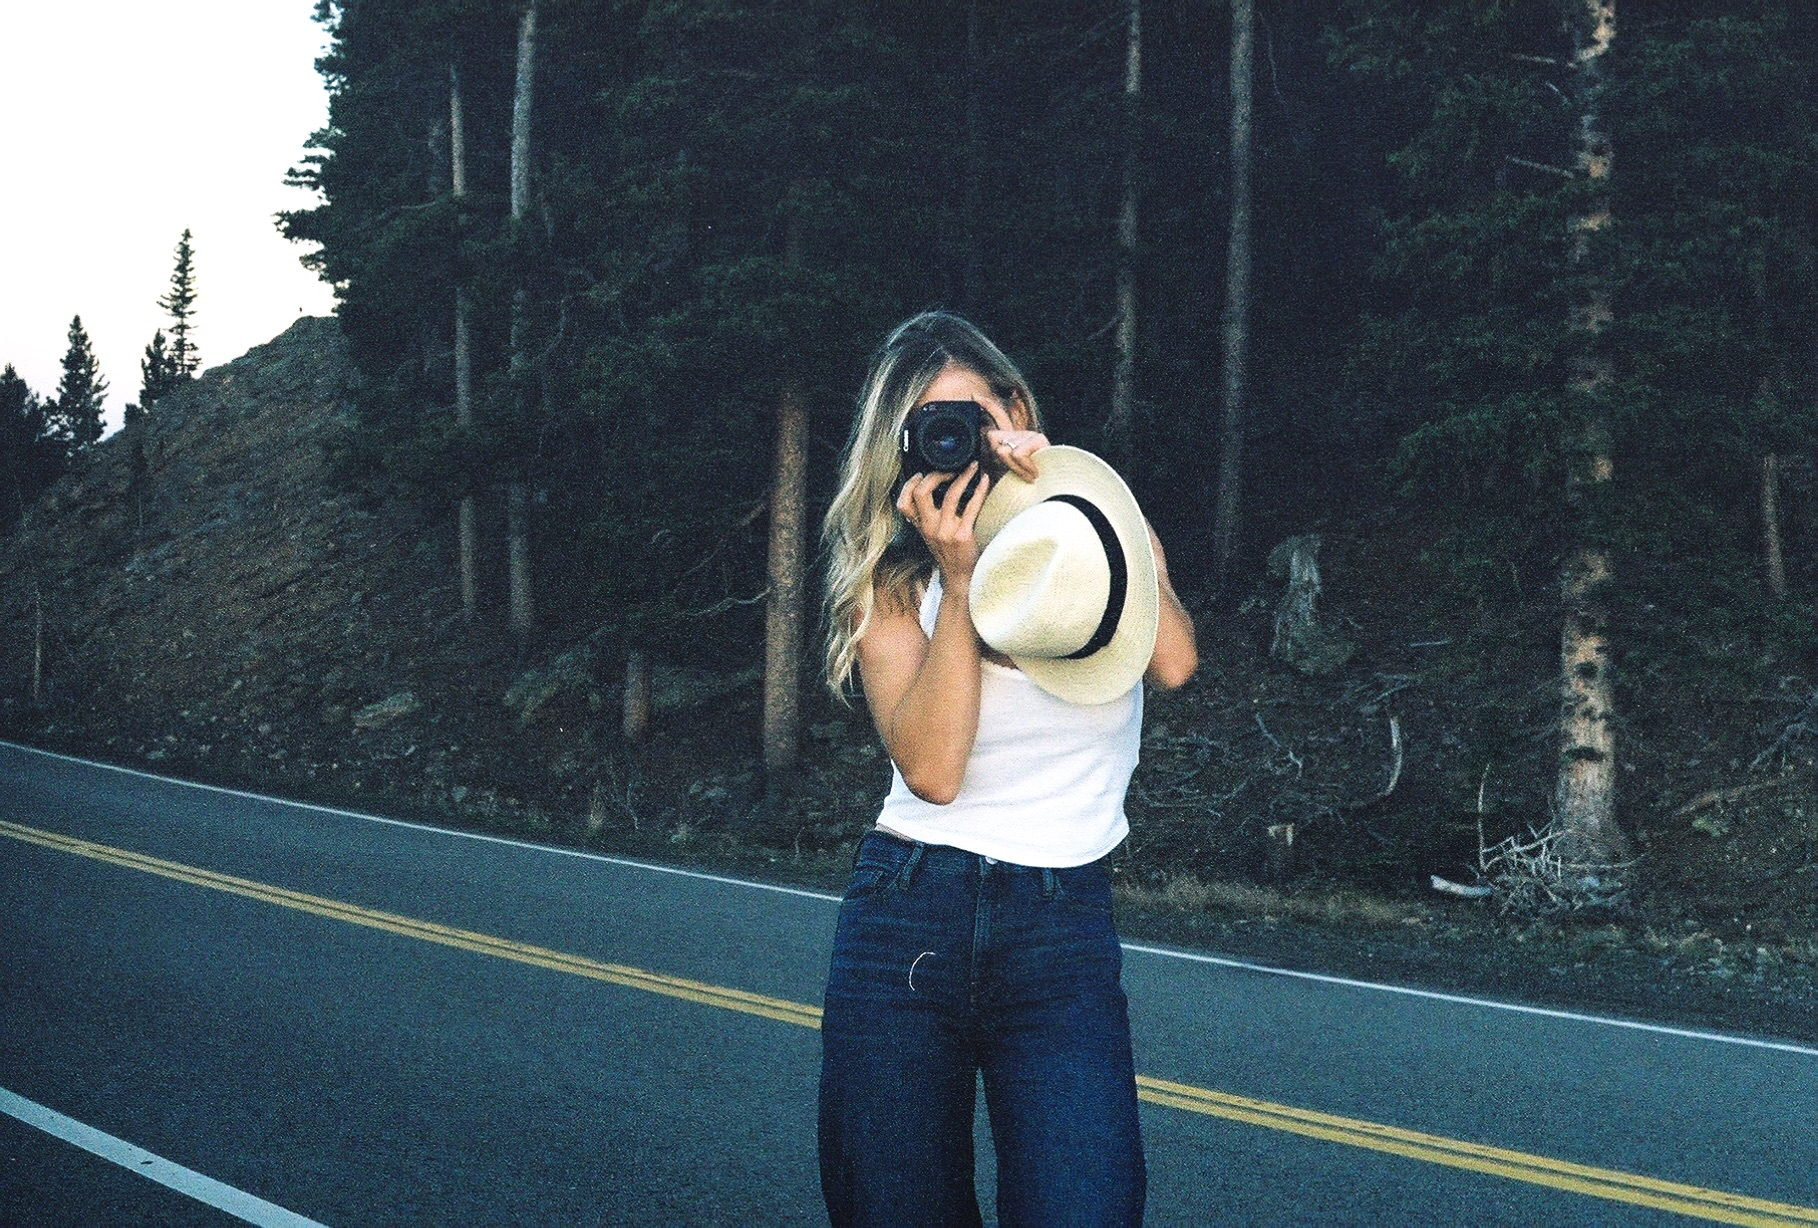 Photo: Sarah's Film